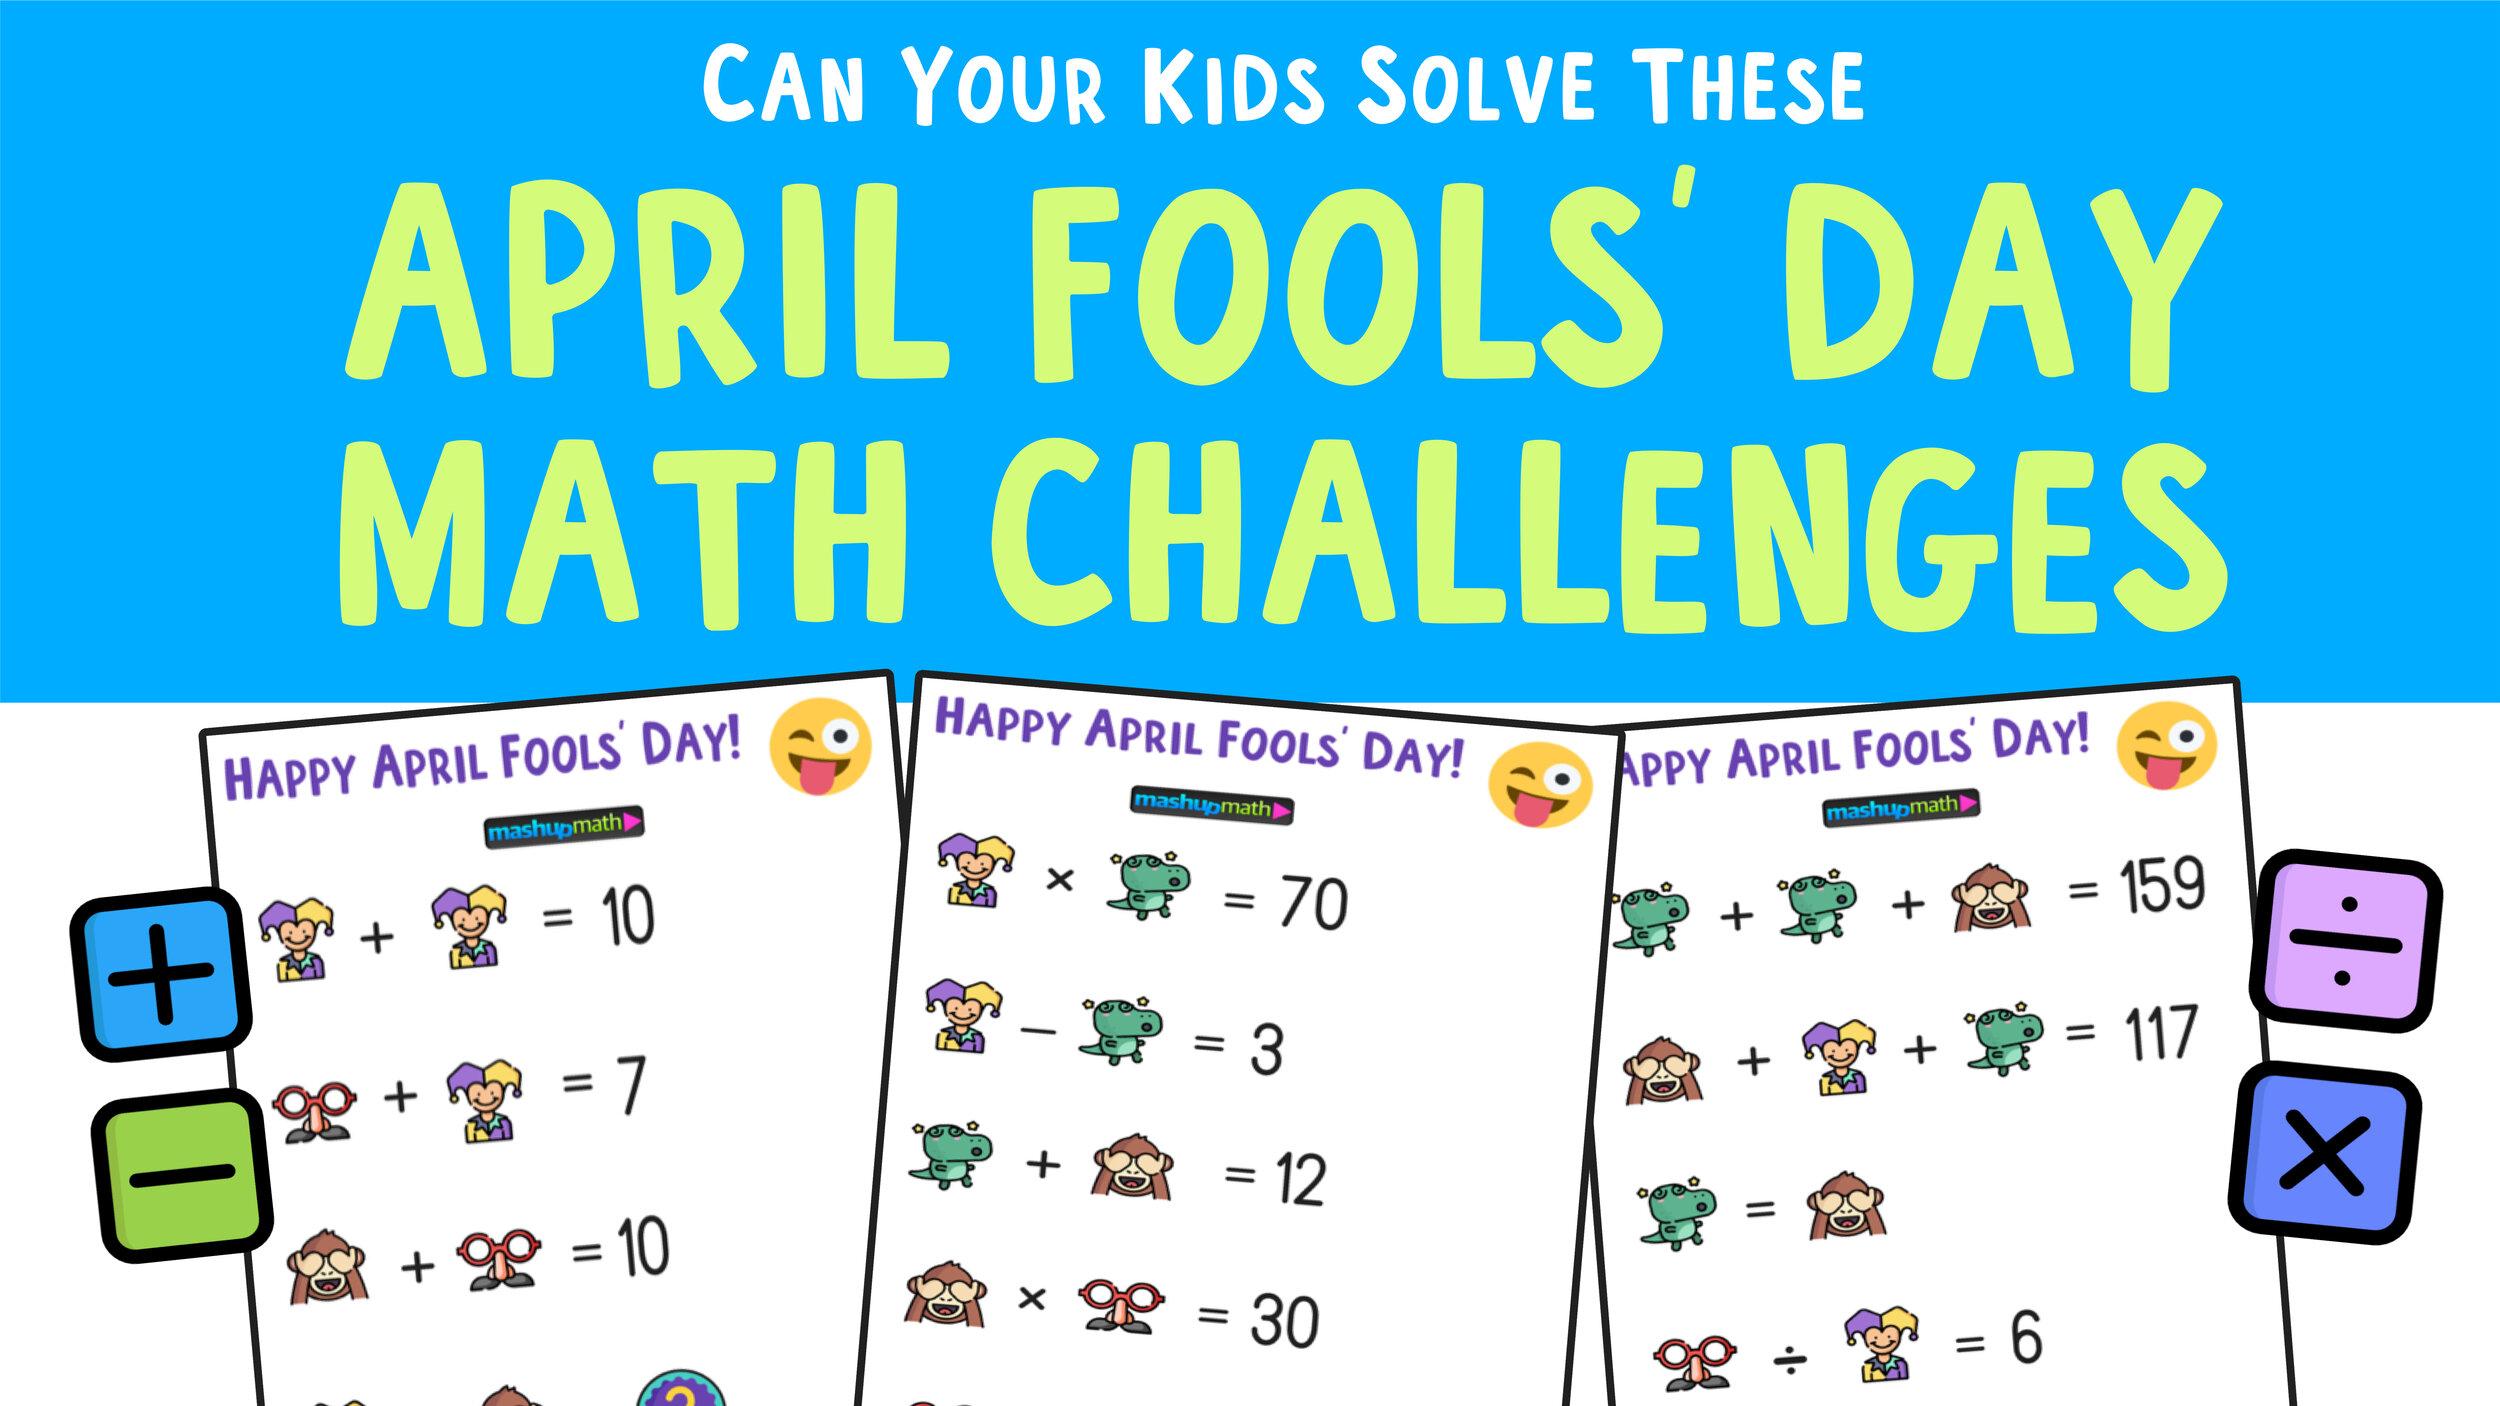 medium resolution of April Fools' Day Math Puzzle for Grades 1-6 — Mashup Math